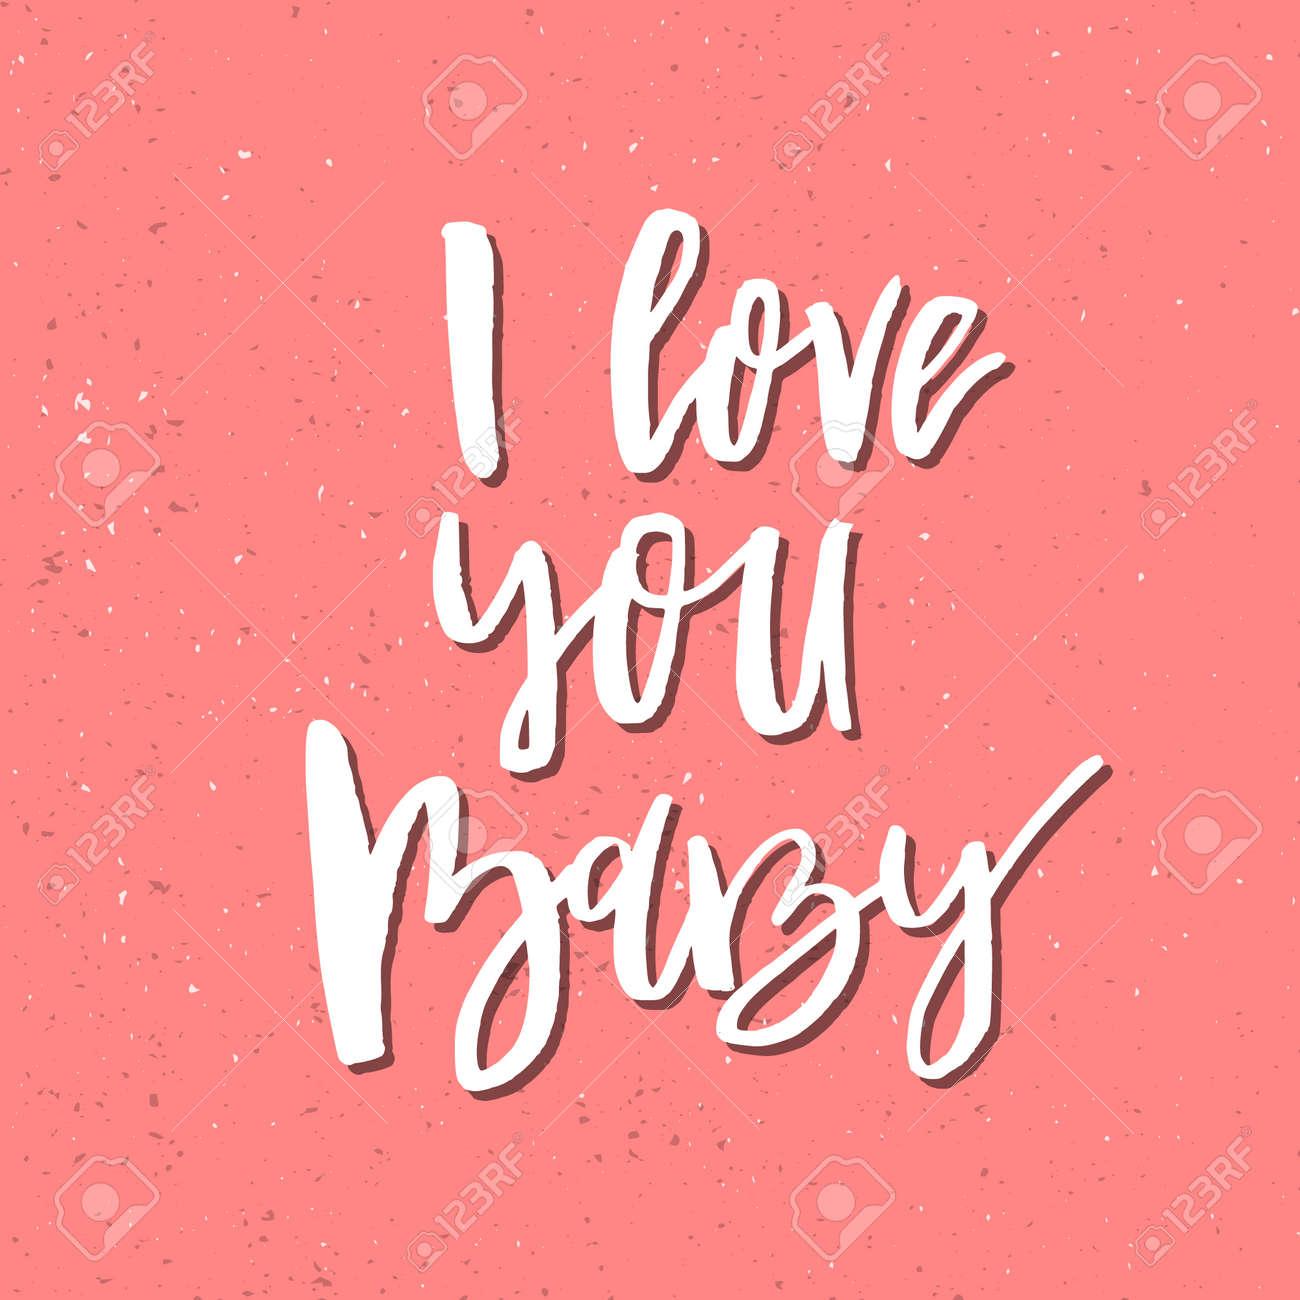 I Love You Baby - Inspirational Valentines day romantic handwritten..